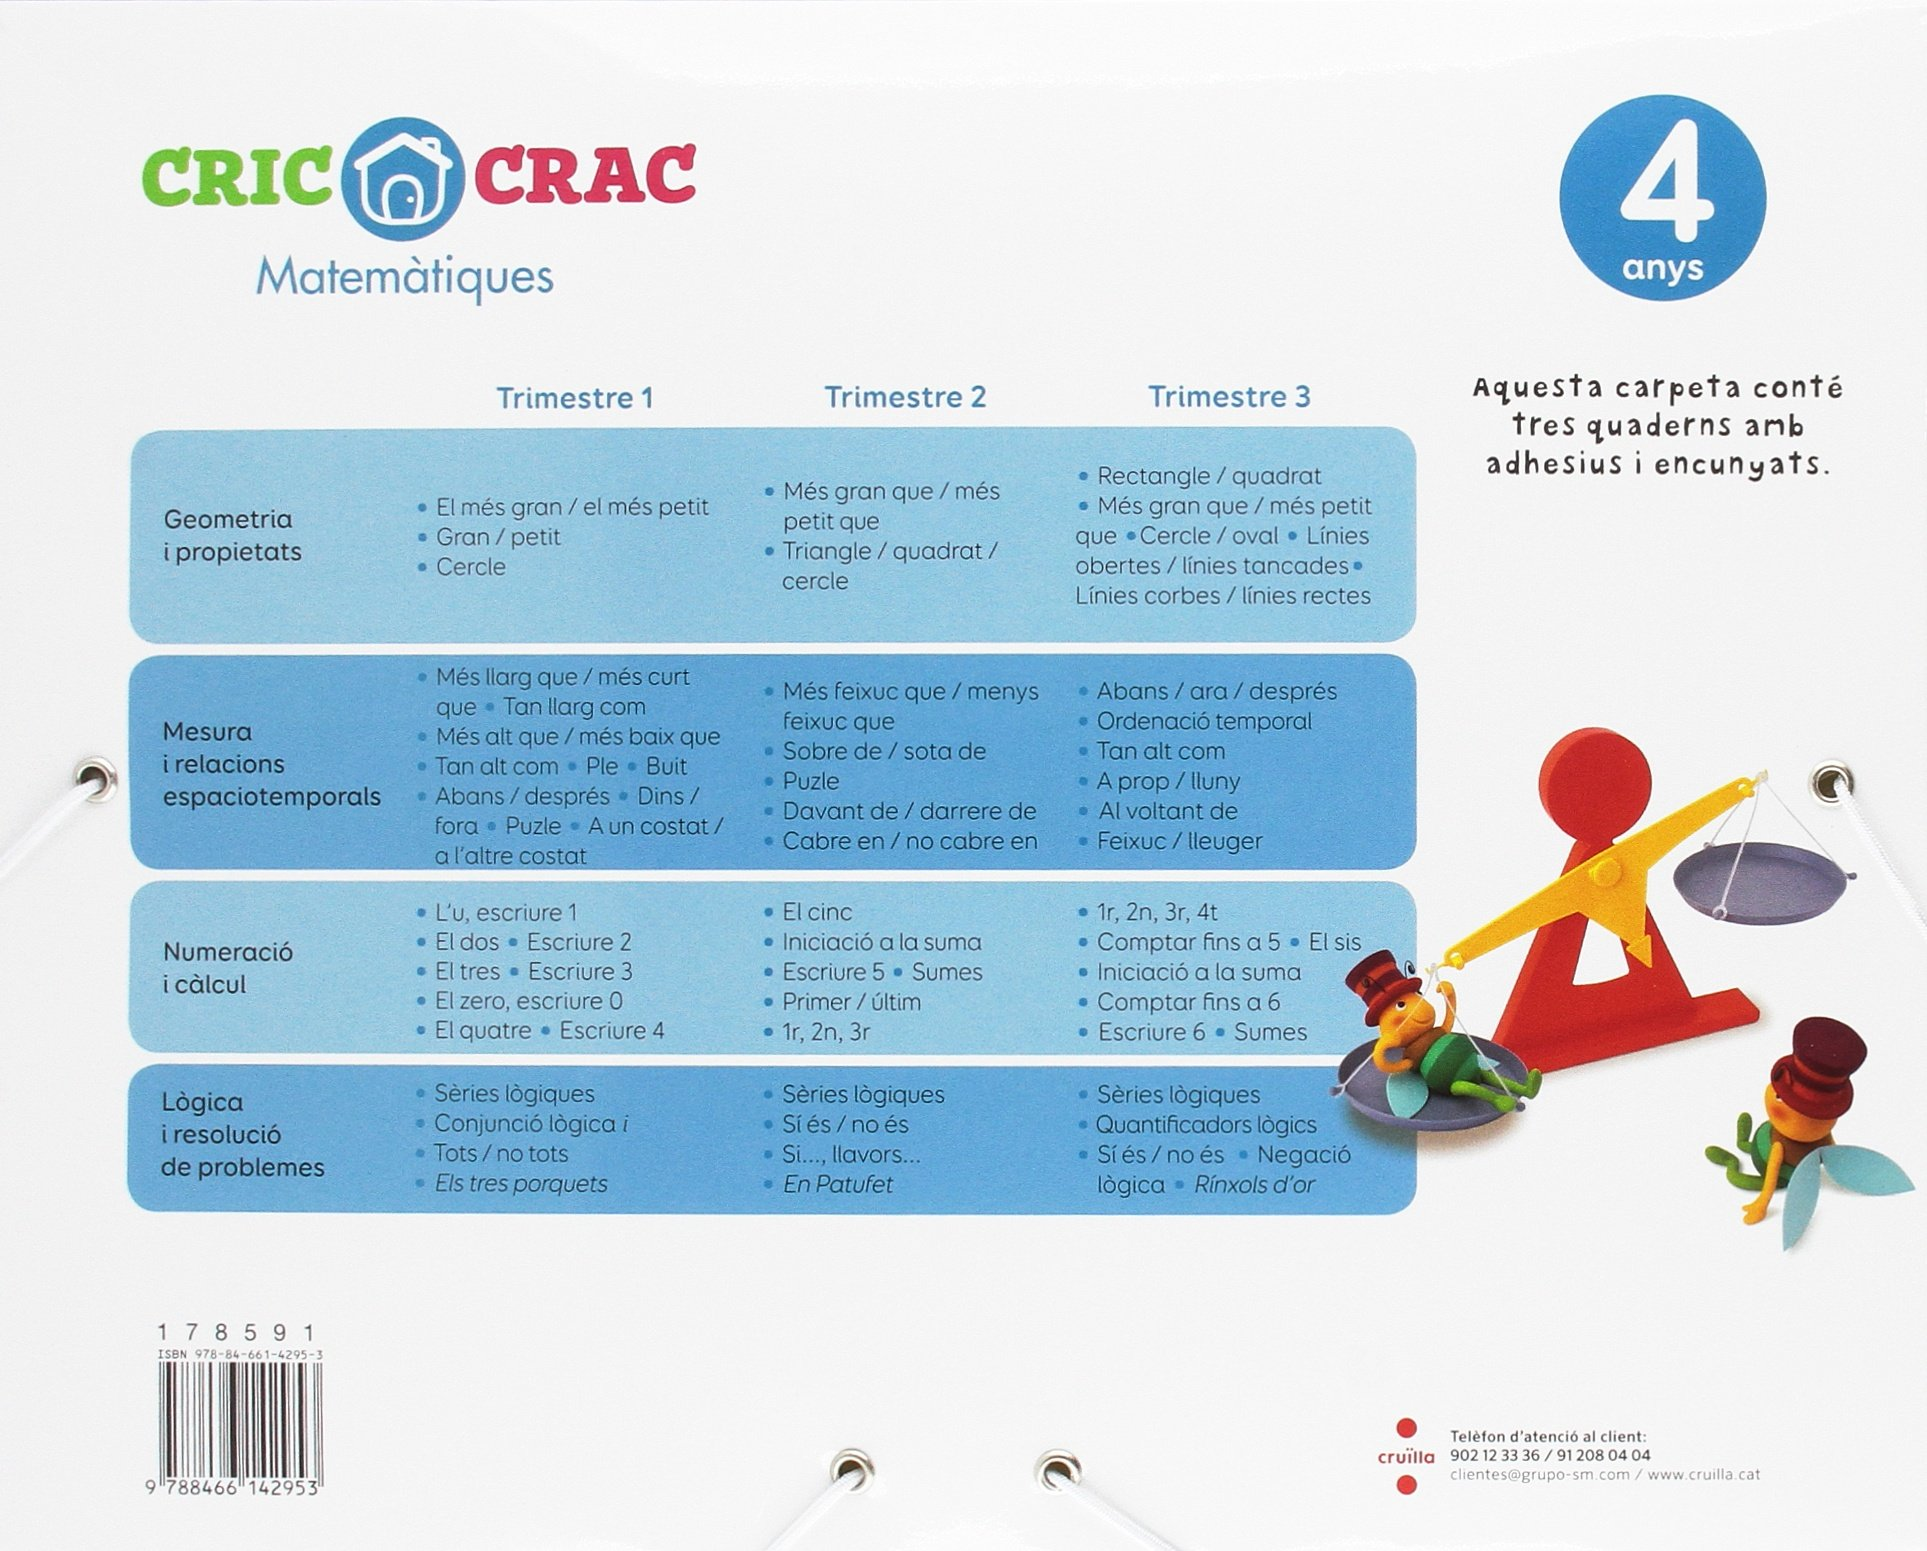 Matemàtiques. 4 anys. Cric-Crac: Amazon.es: Javier Bernabeu Ruiz, David Arumi Casanovas, Carles Martí, Artur Laperla, Ana Villalba Hernández, ...